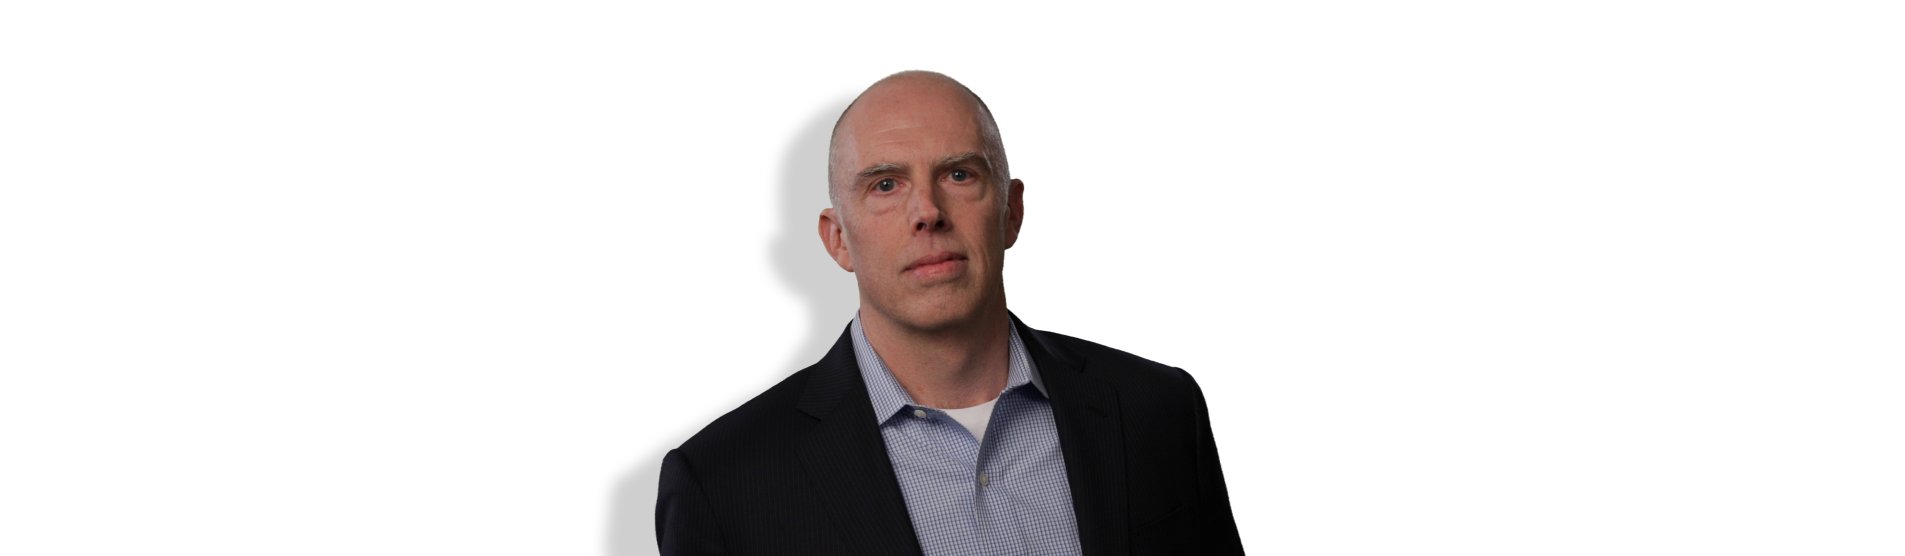 Headshot of Brian J. Hubbard